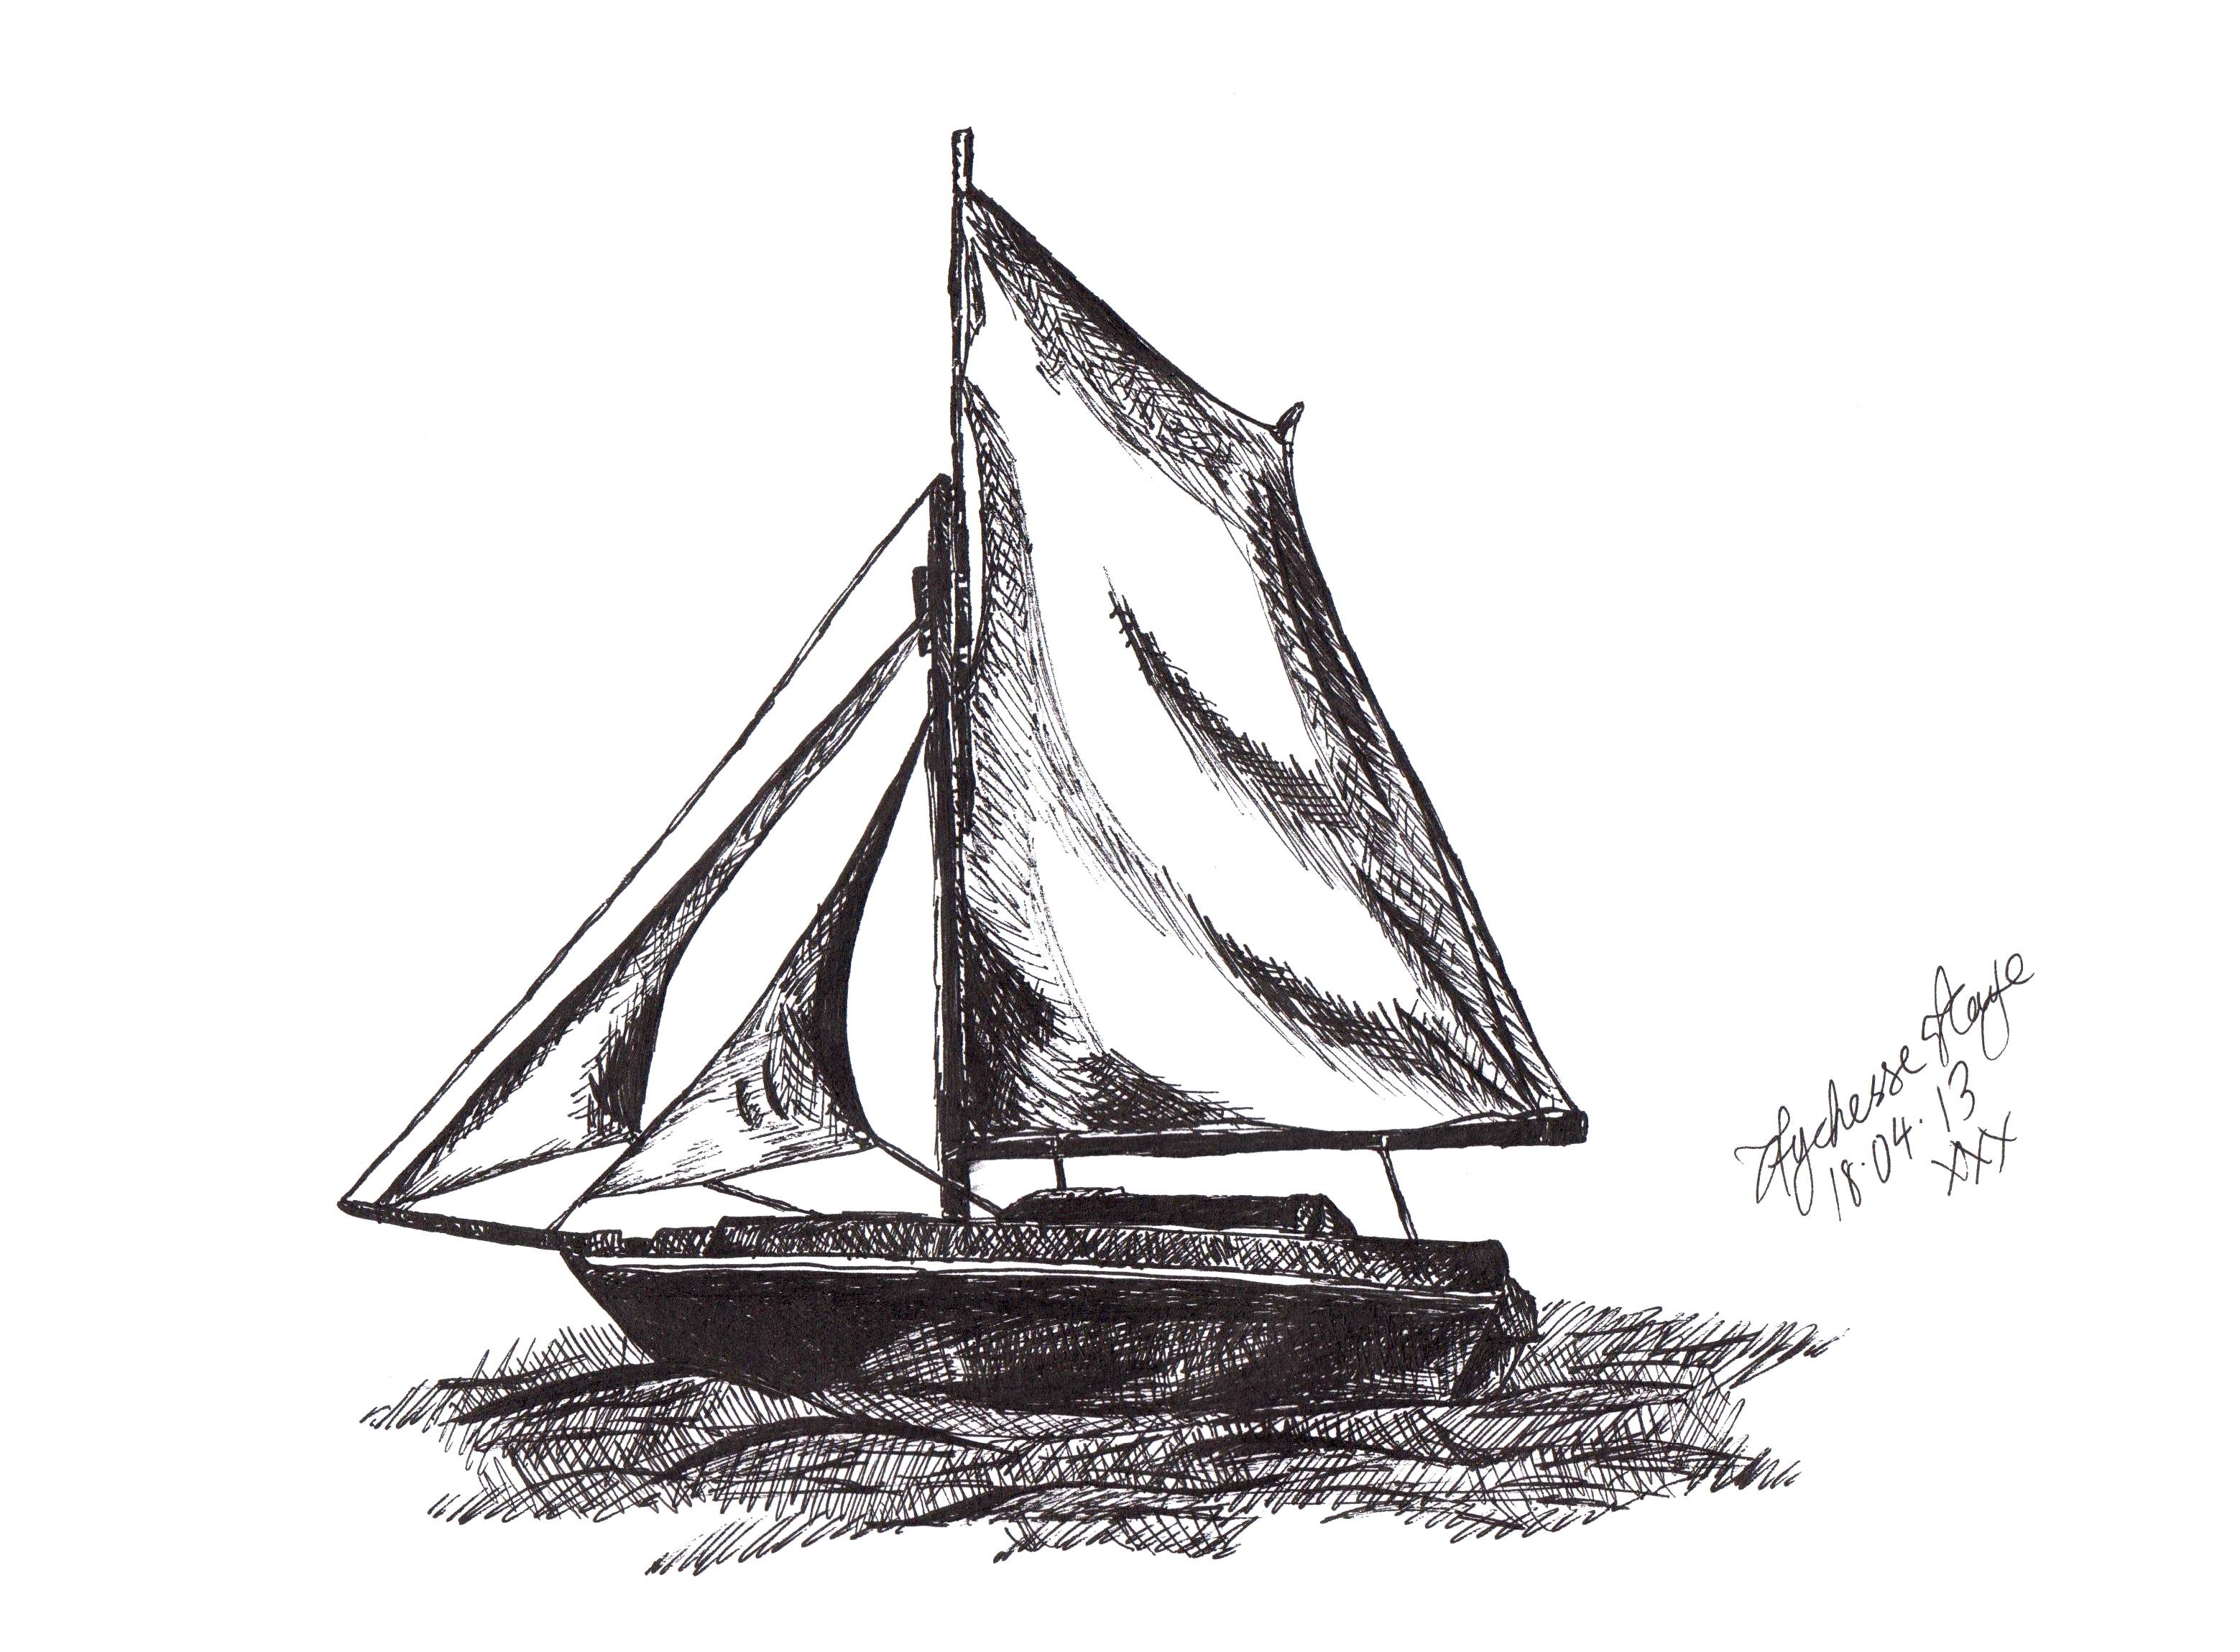 Drawn boat – Drawing: Boat Kaye Aychesse